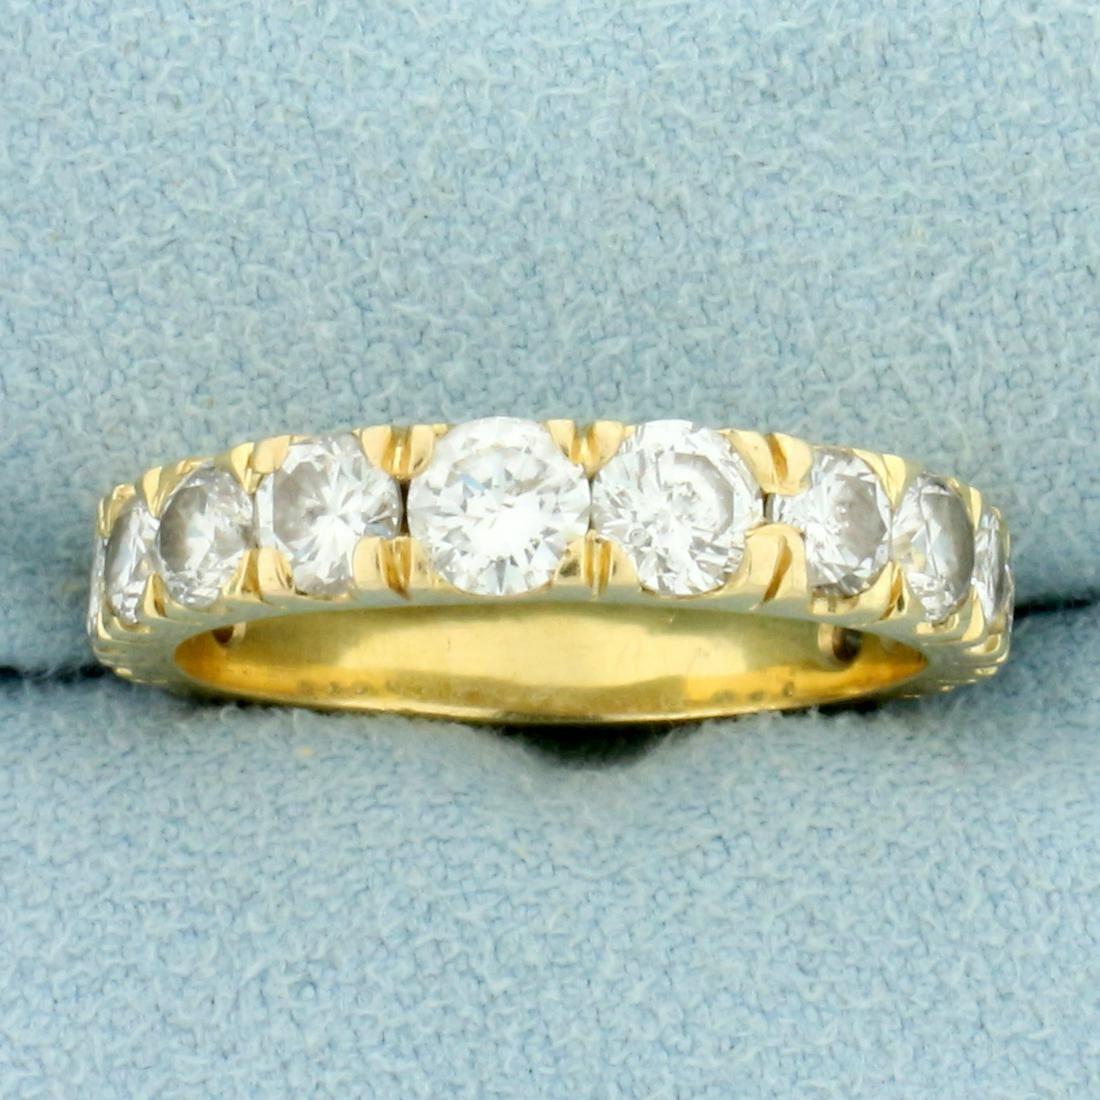 2ct TW Diamond Wedding or Anniversary Ring in 14K